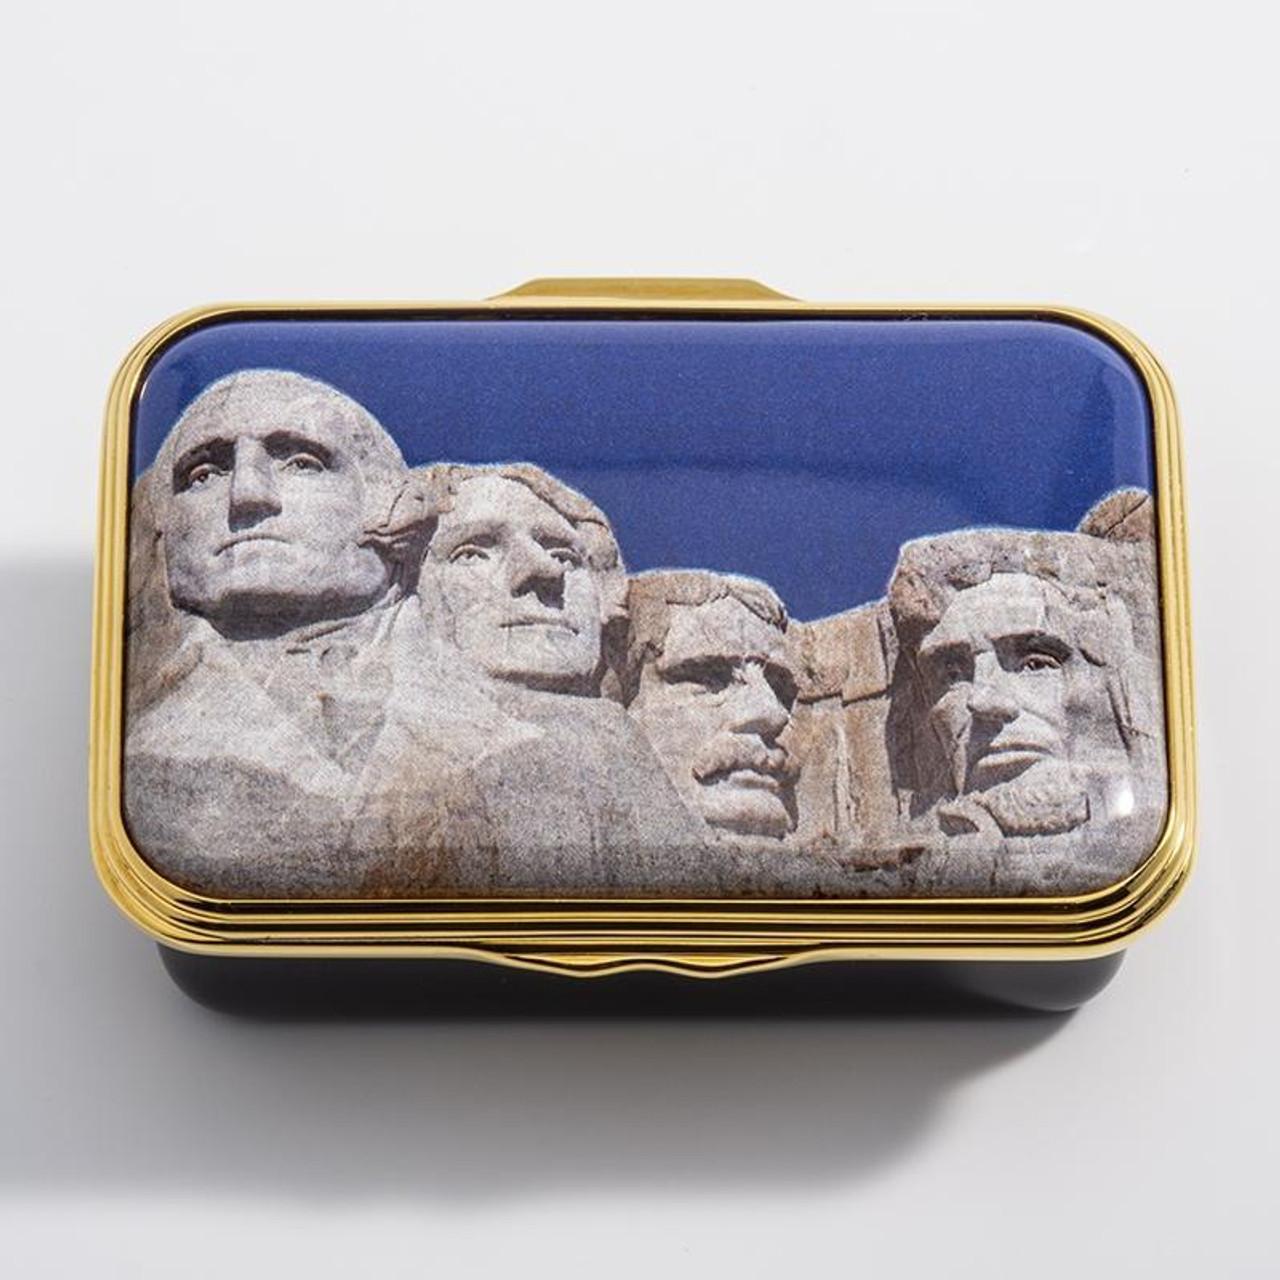 Halcyon Days Mount Rushmore ENMNR1123G